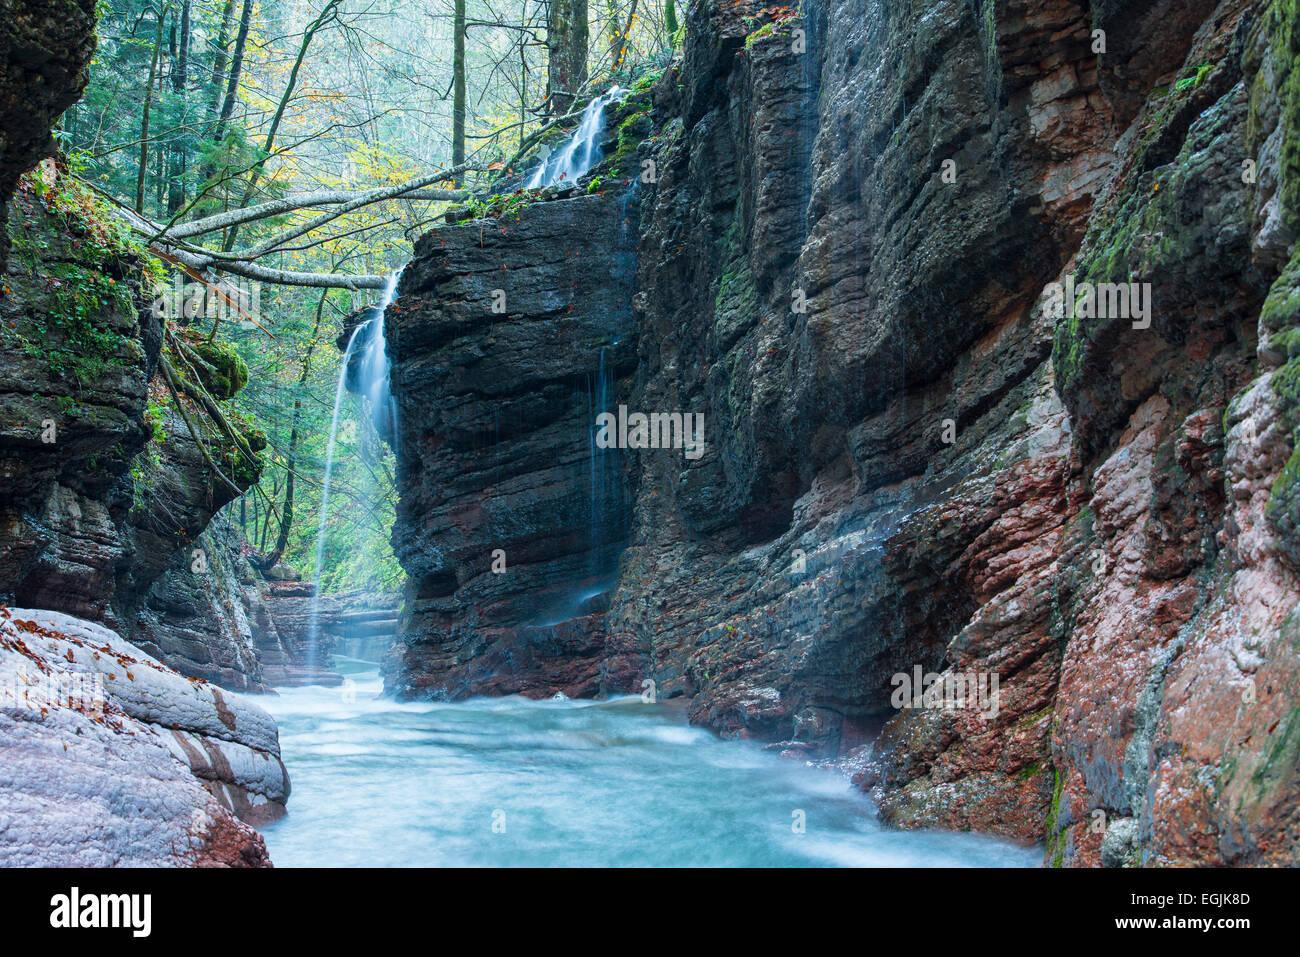 Taugl stream, Tauglbach or Taugl River, Taugl River Gorge, Tennengau region, Salzburg State, Austria Stock Photo